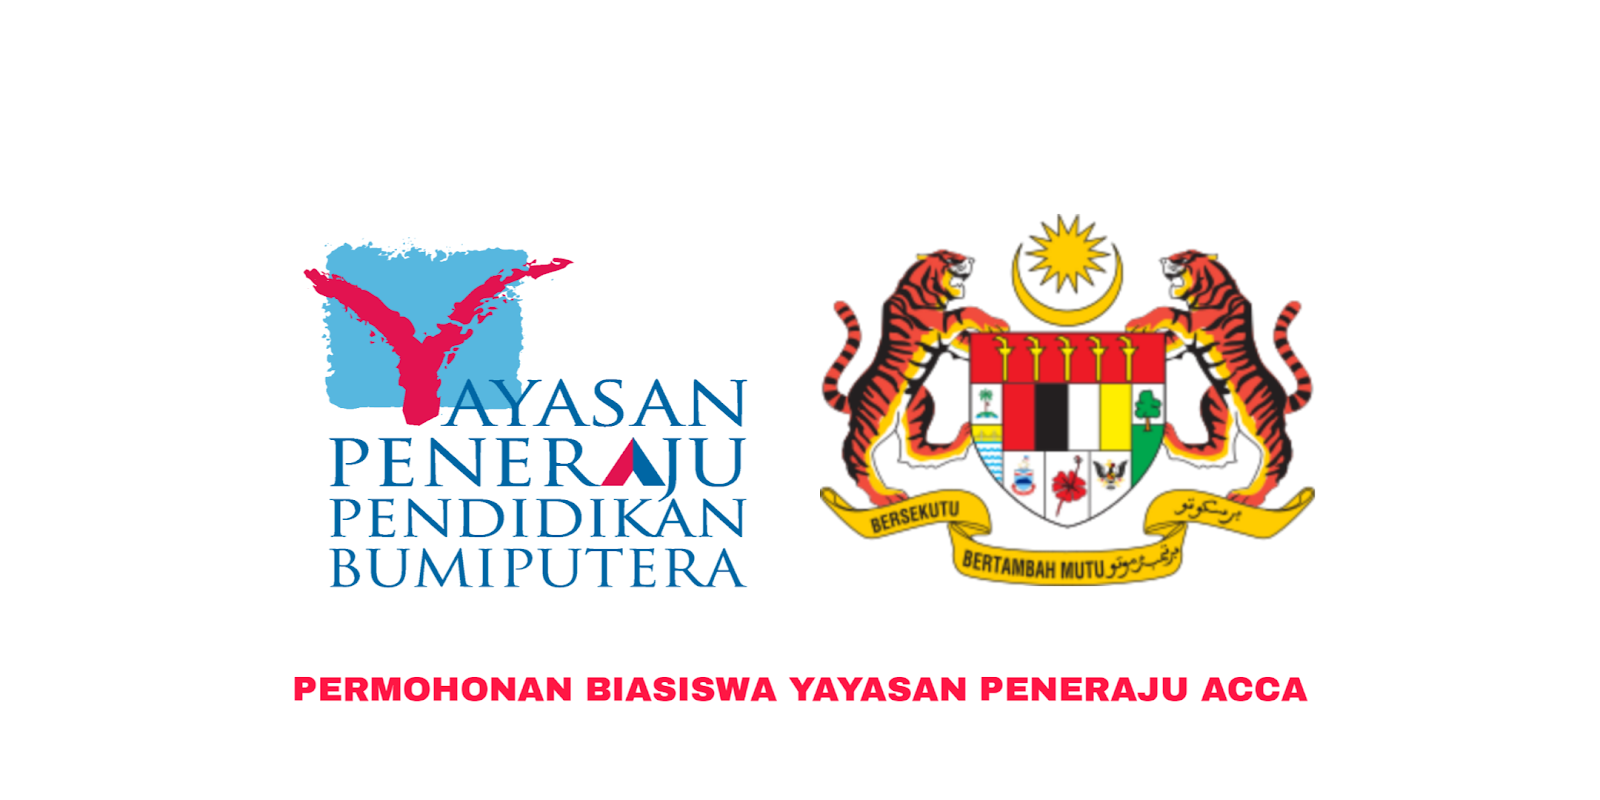 Permohonan Biasiswa Yayasan Peneraju Acca 2020 Online Semakan Upu